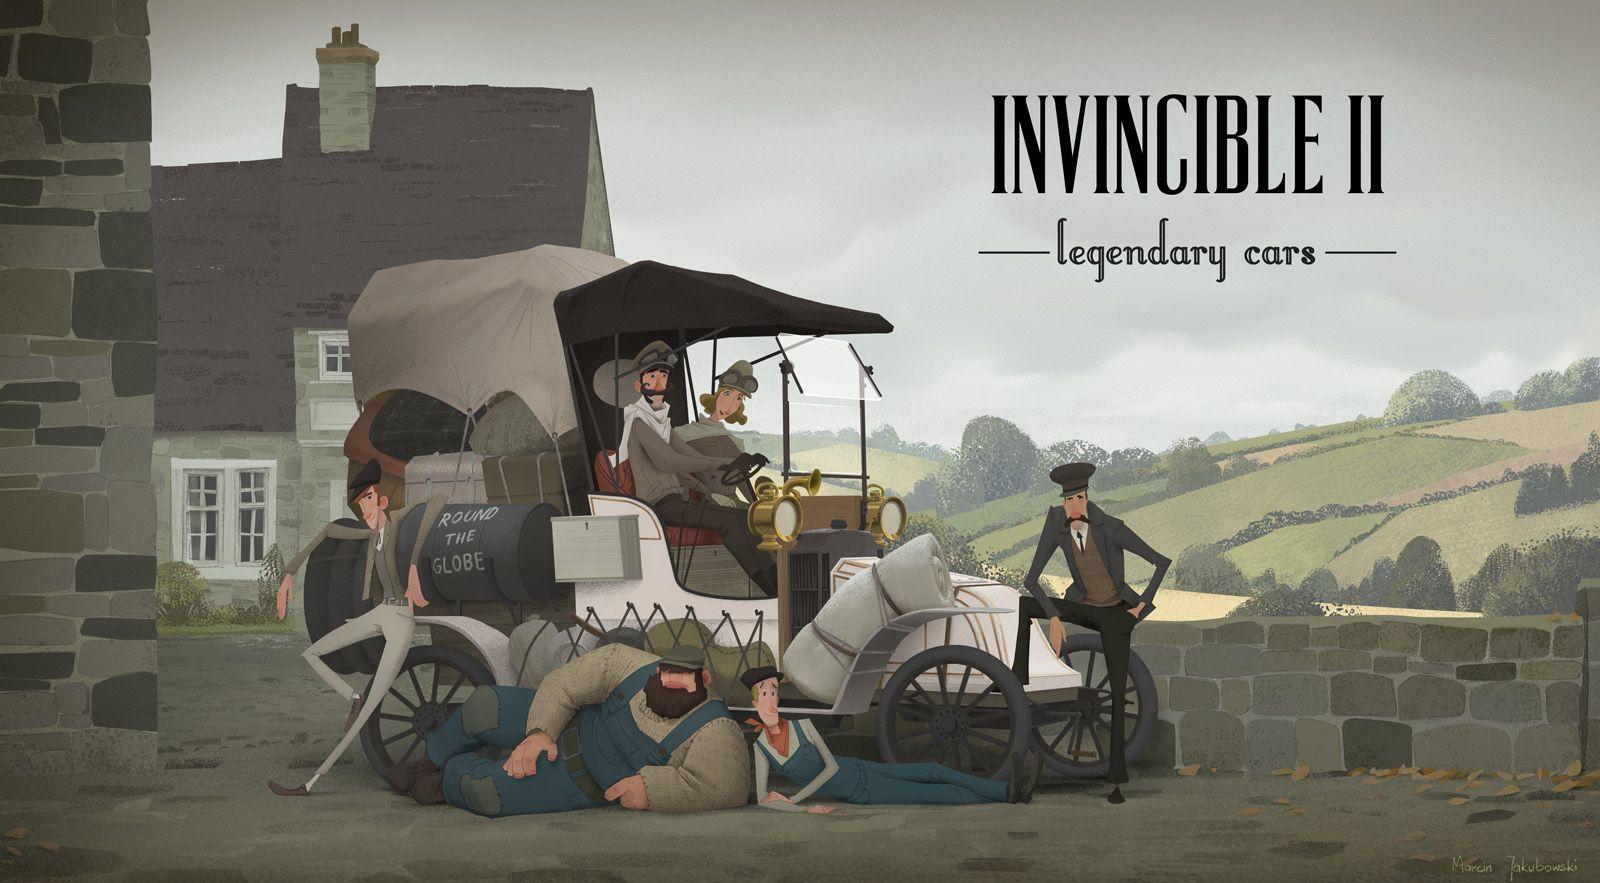 http://balloontree.com/img/illustrations/invincibleII_l.jpg